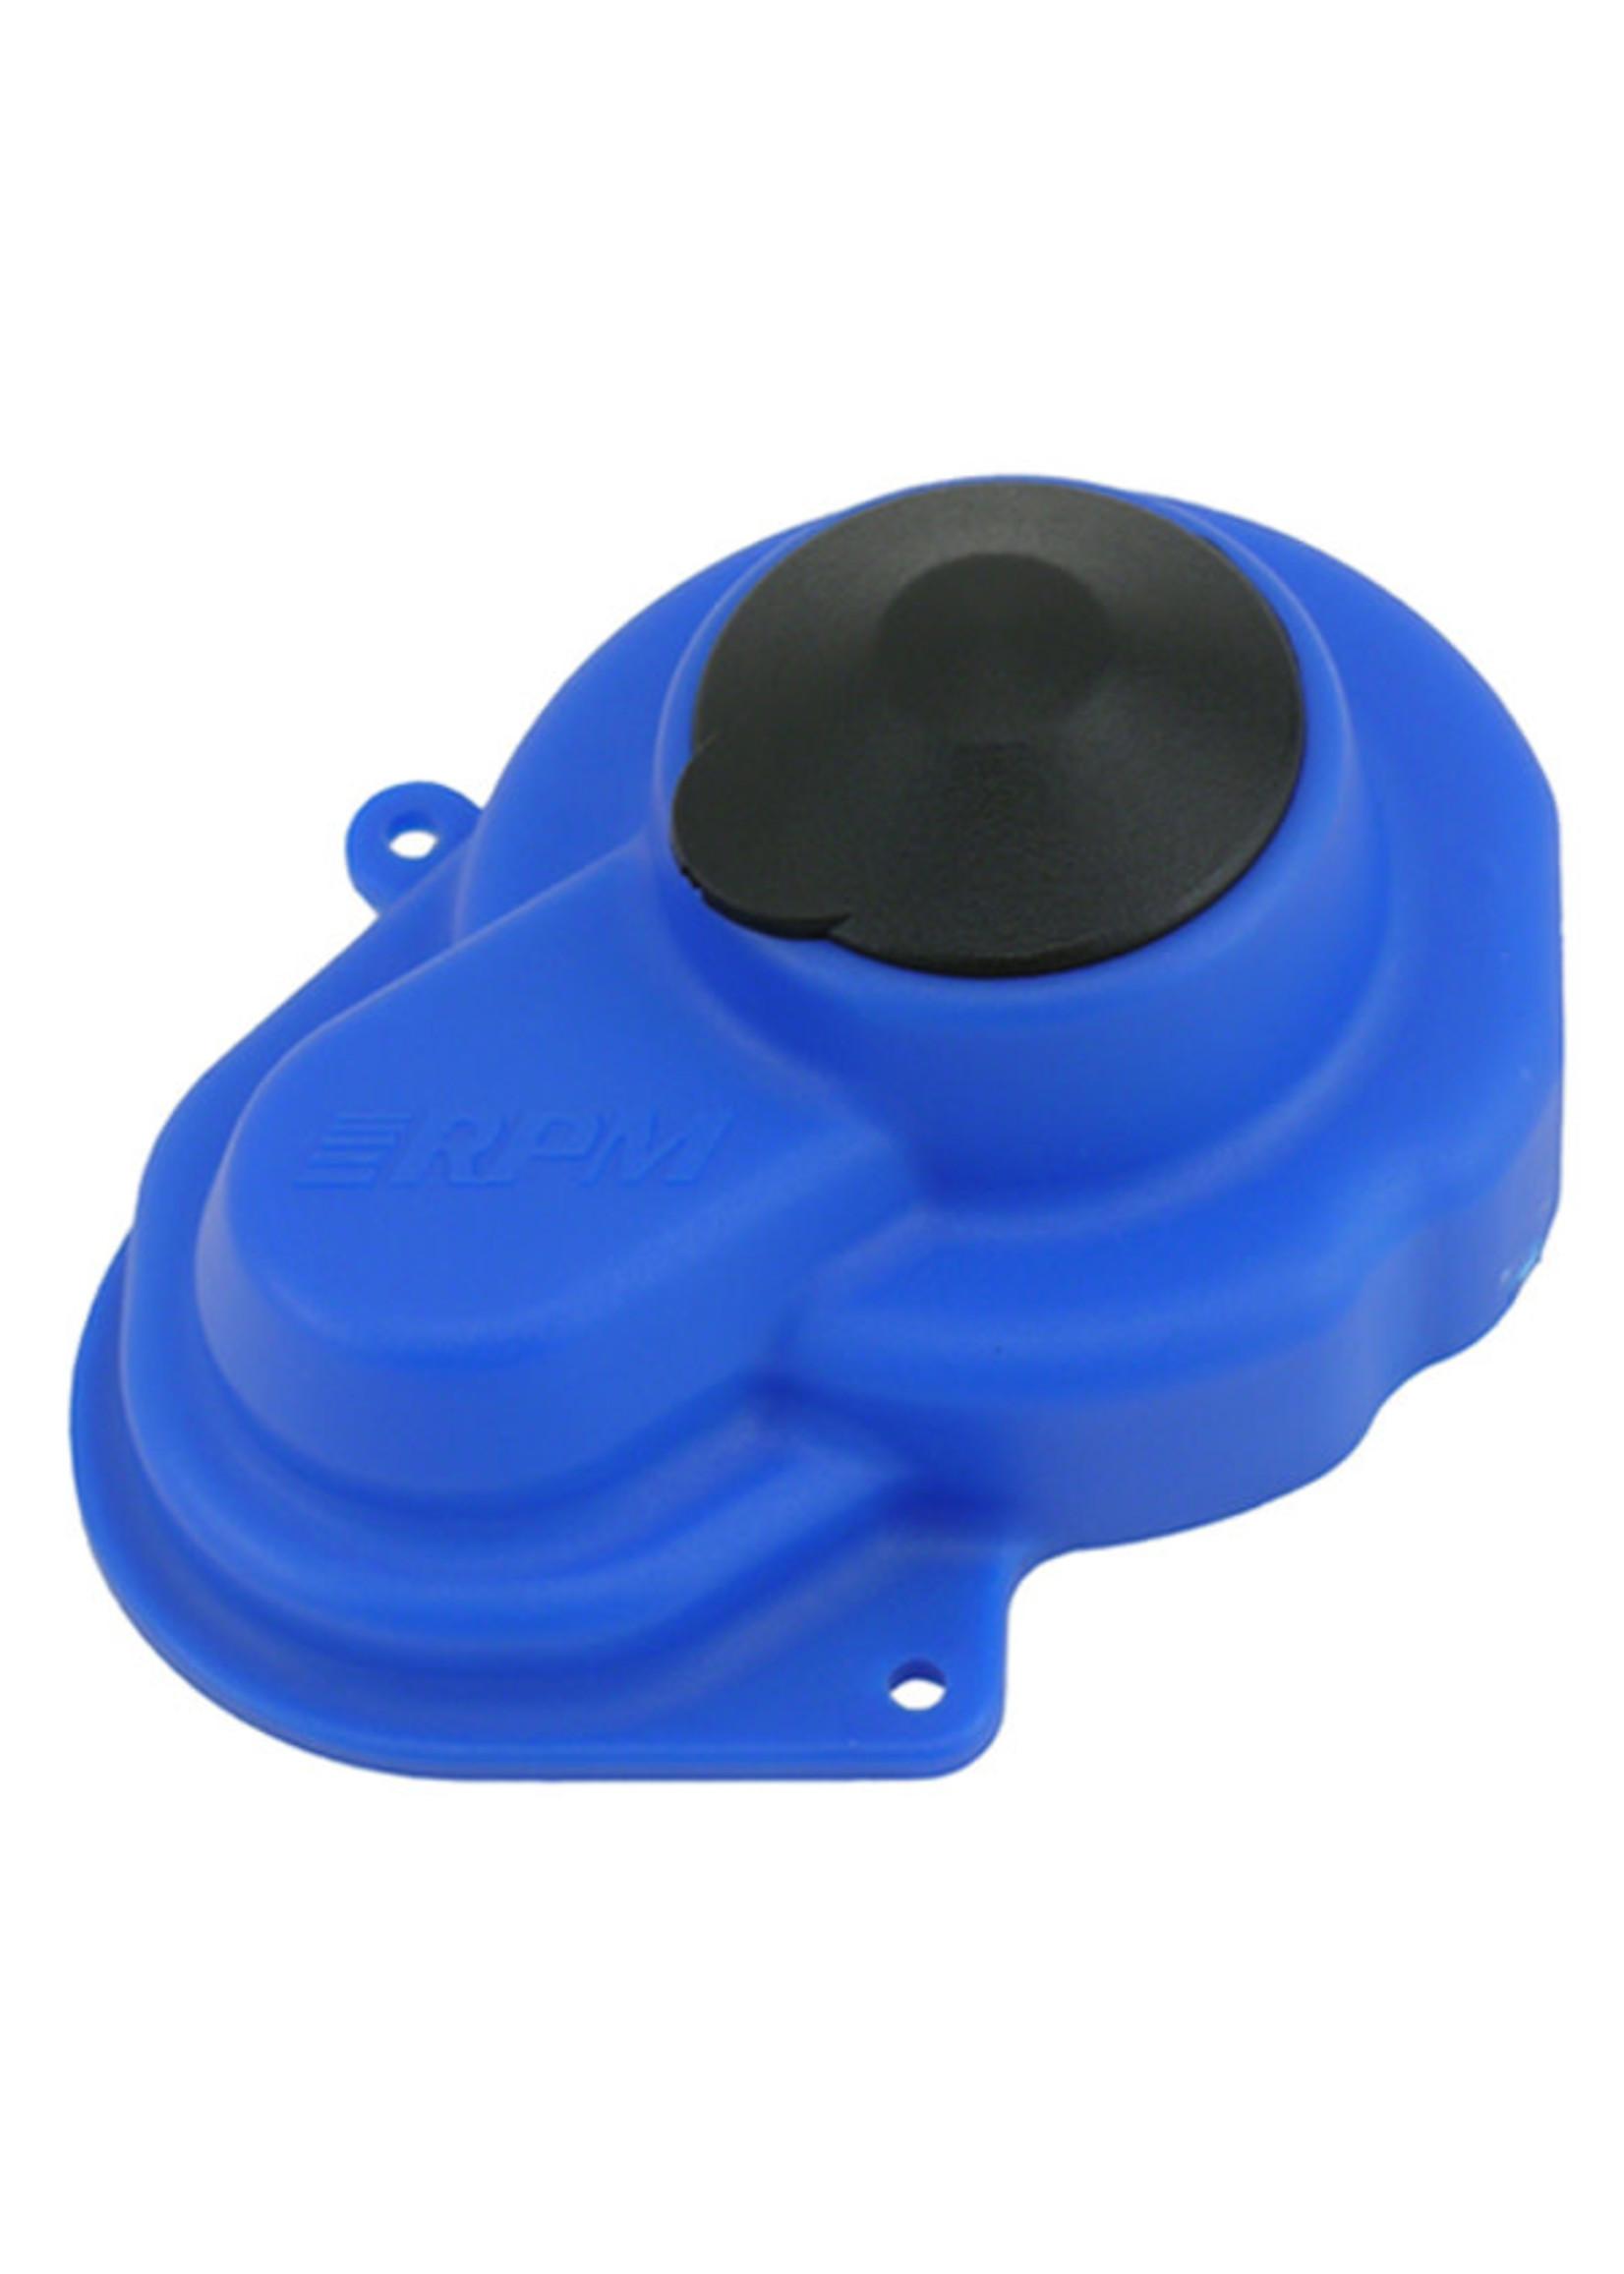 RPM RPM80525 RPM Sealed Gear Cover, for Traxxas e-Rustler/Stampede 2wd/Bandit/Slash, Blue